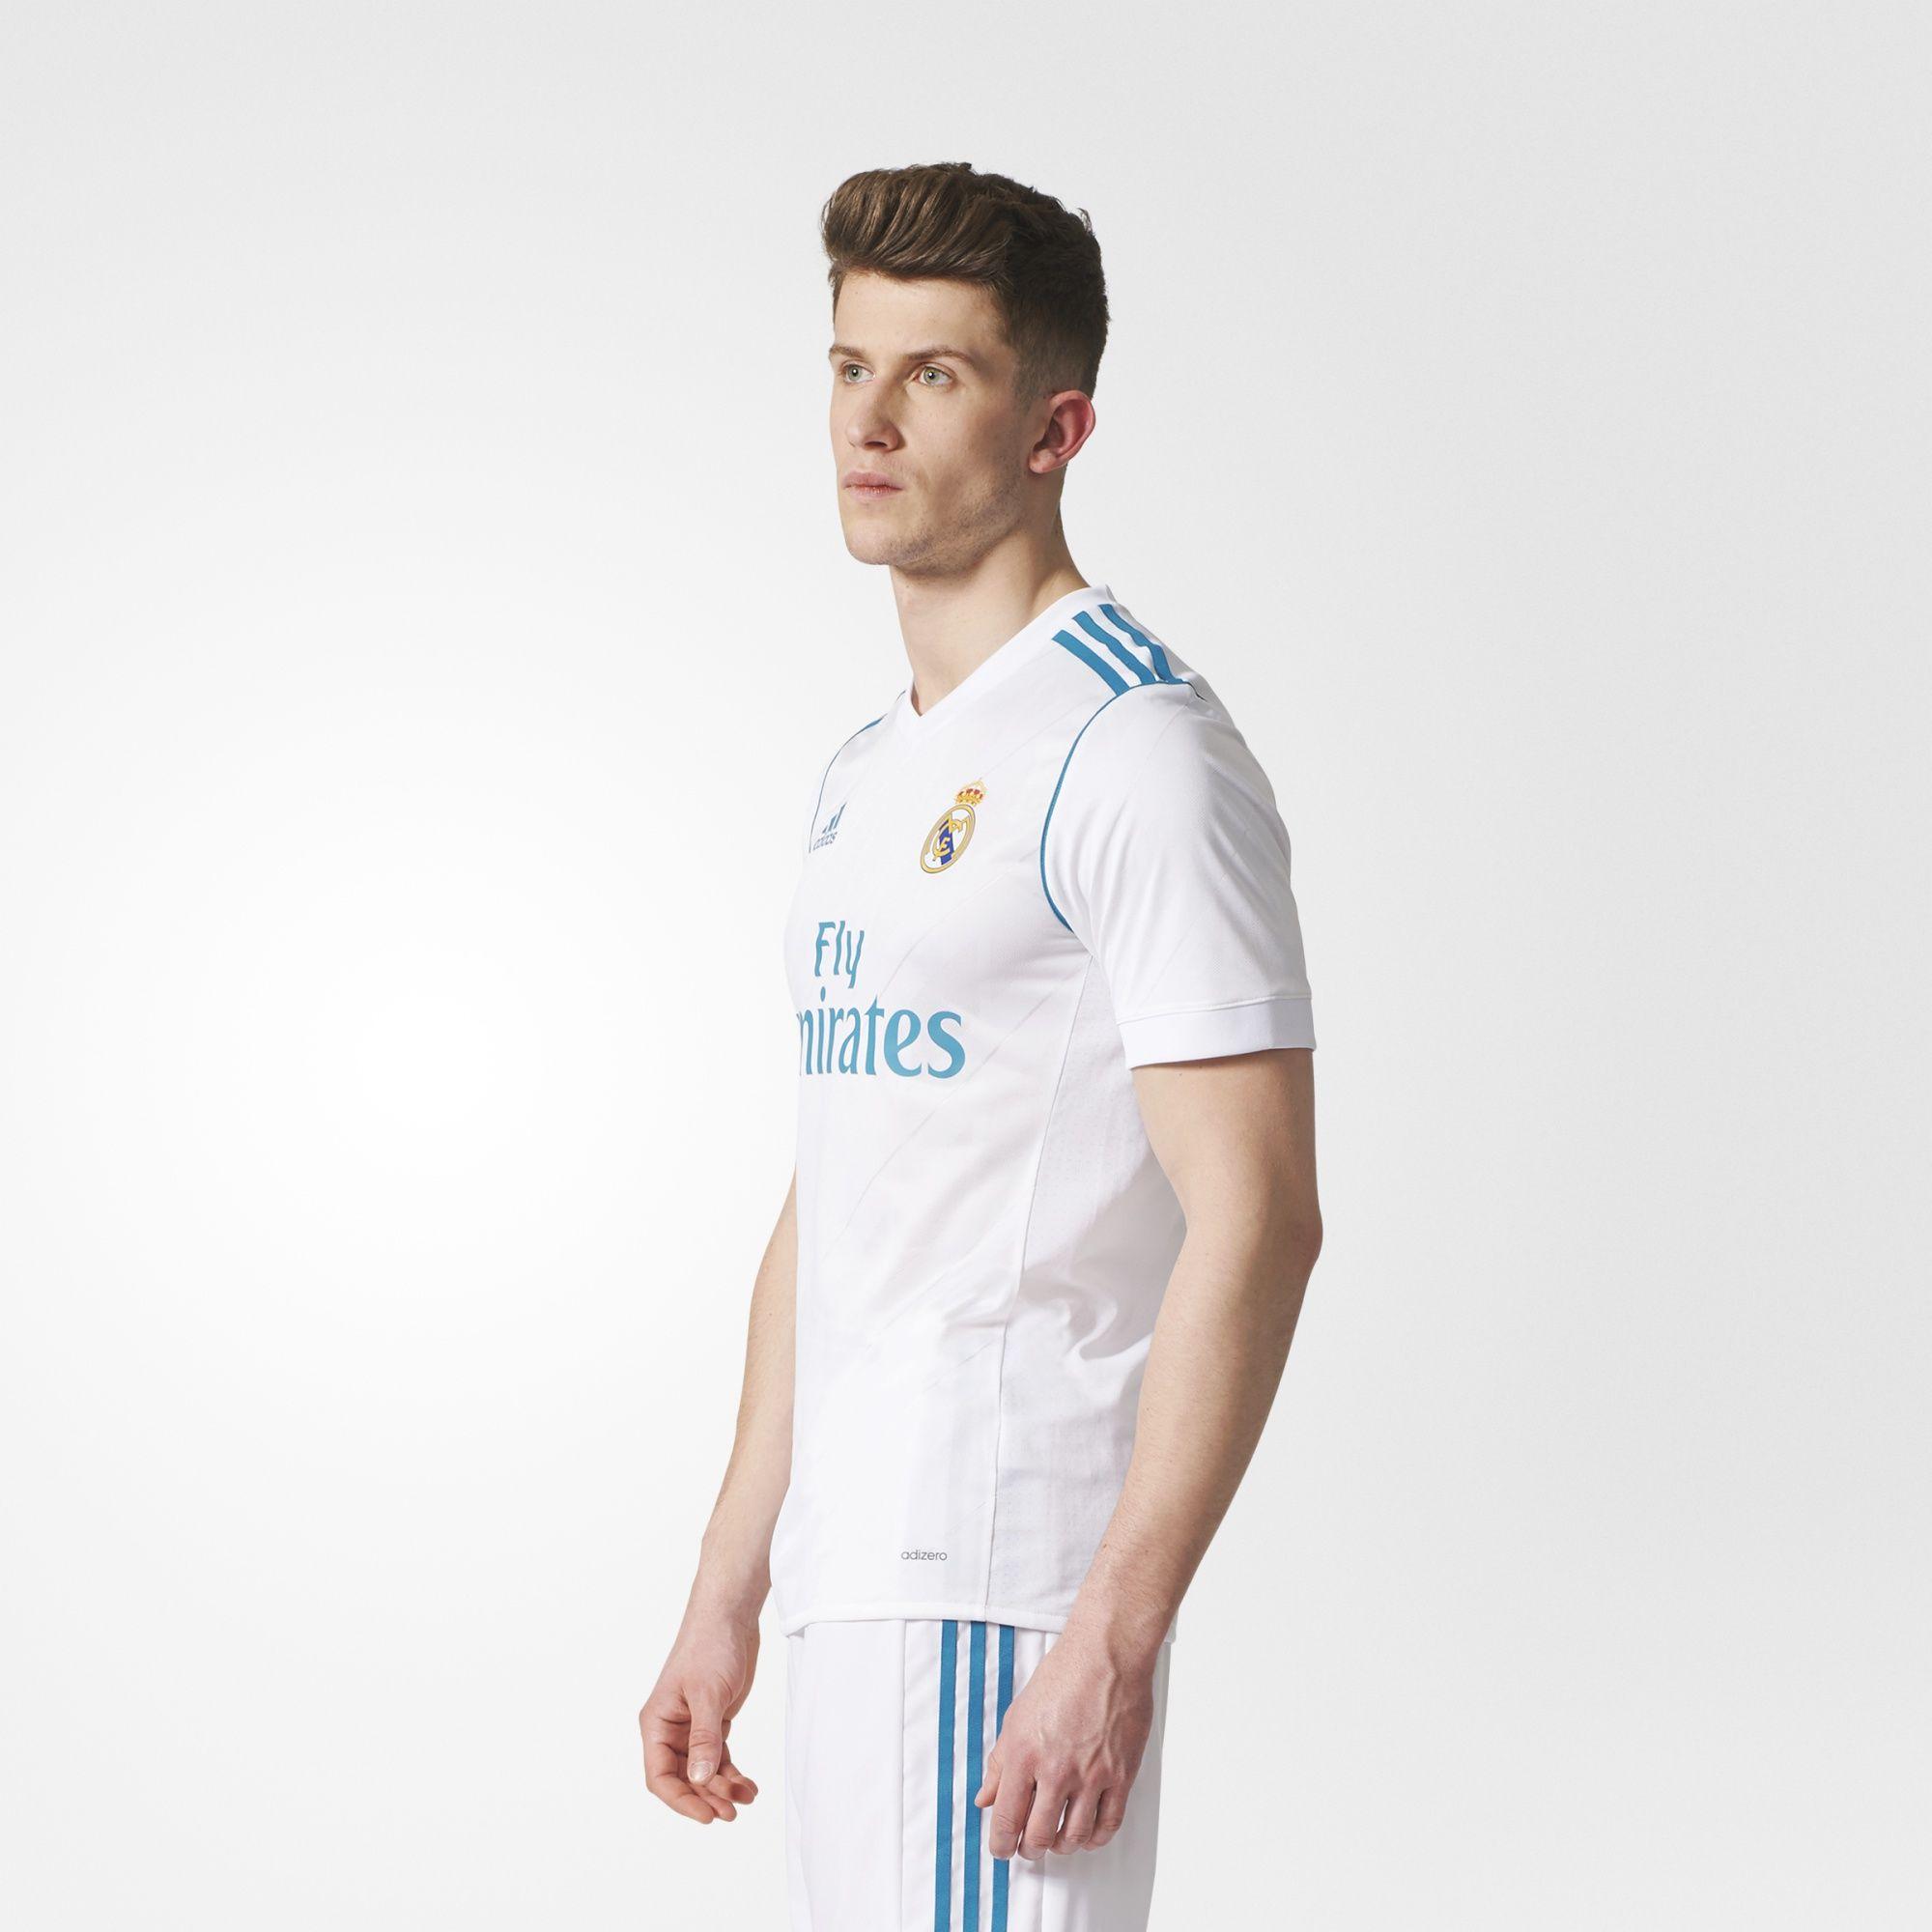 real_madrid_17_18_adidas_home_kit_side